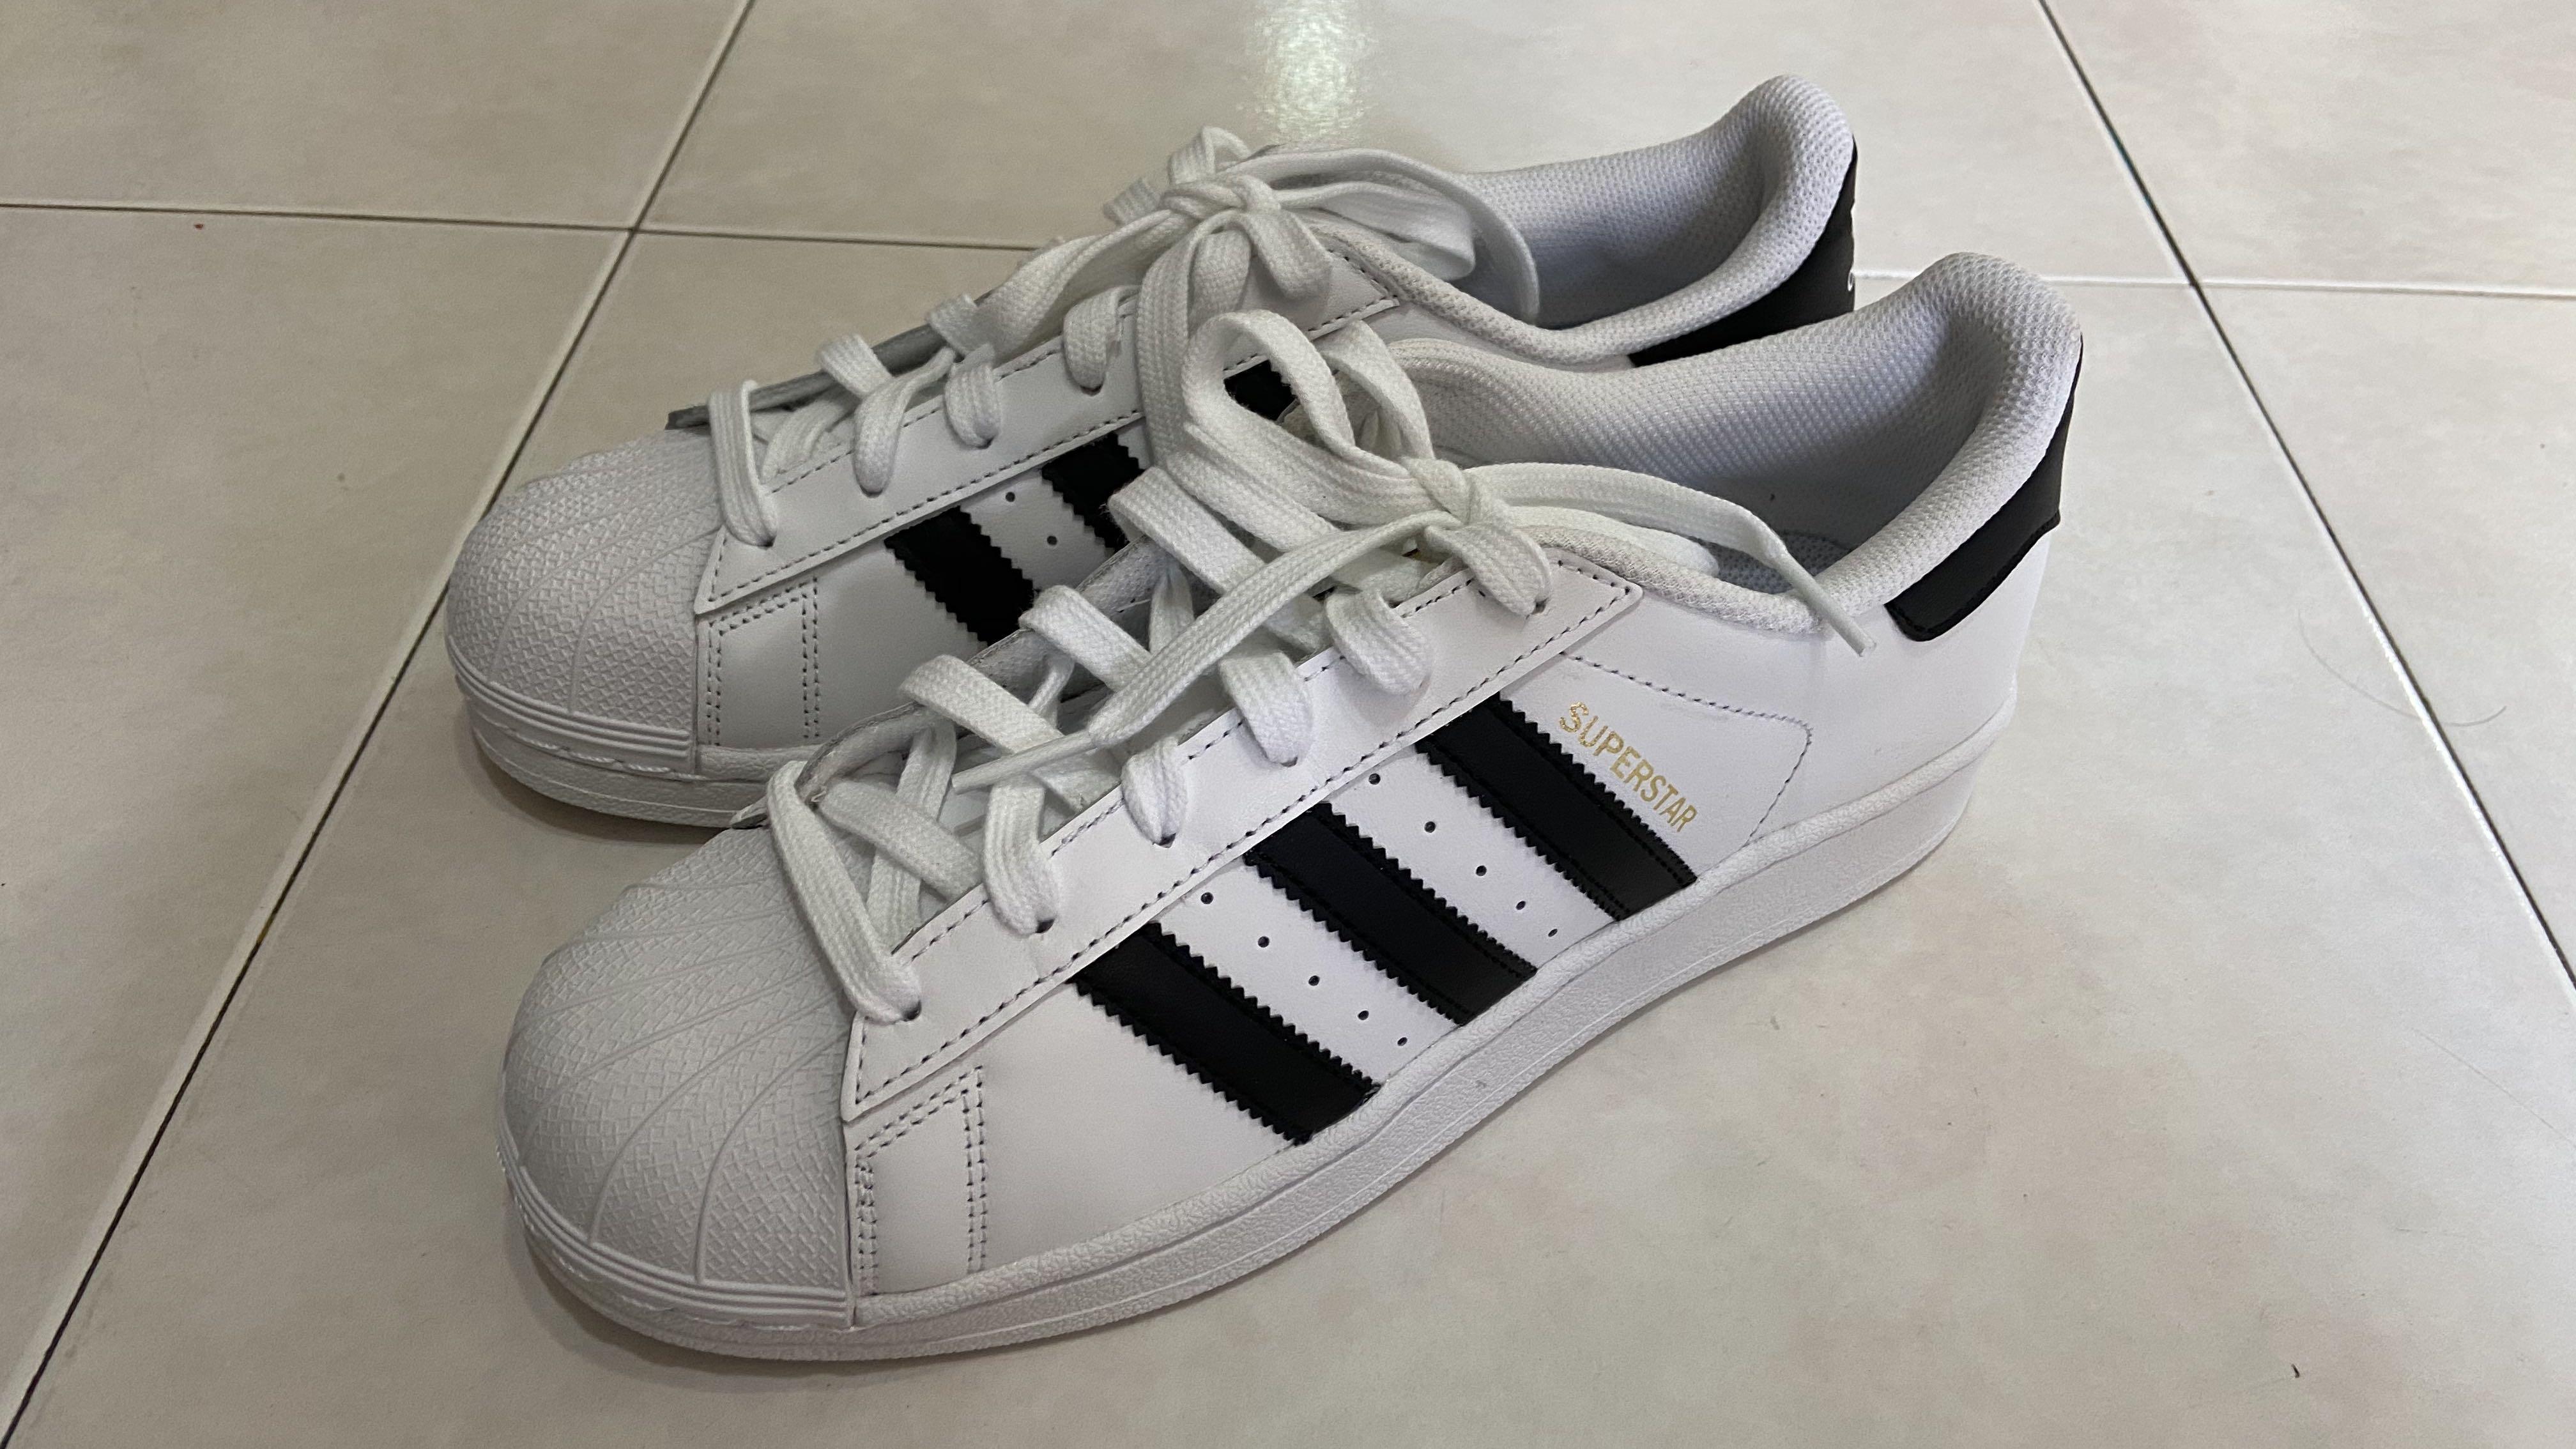 Adidas Superstar Shoes (Youth) UK 5.5